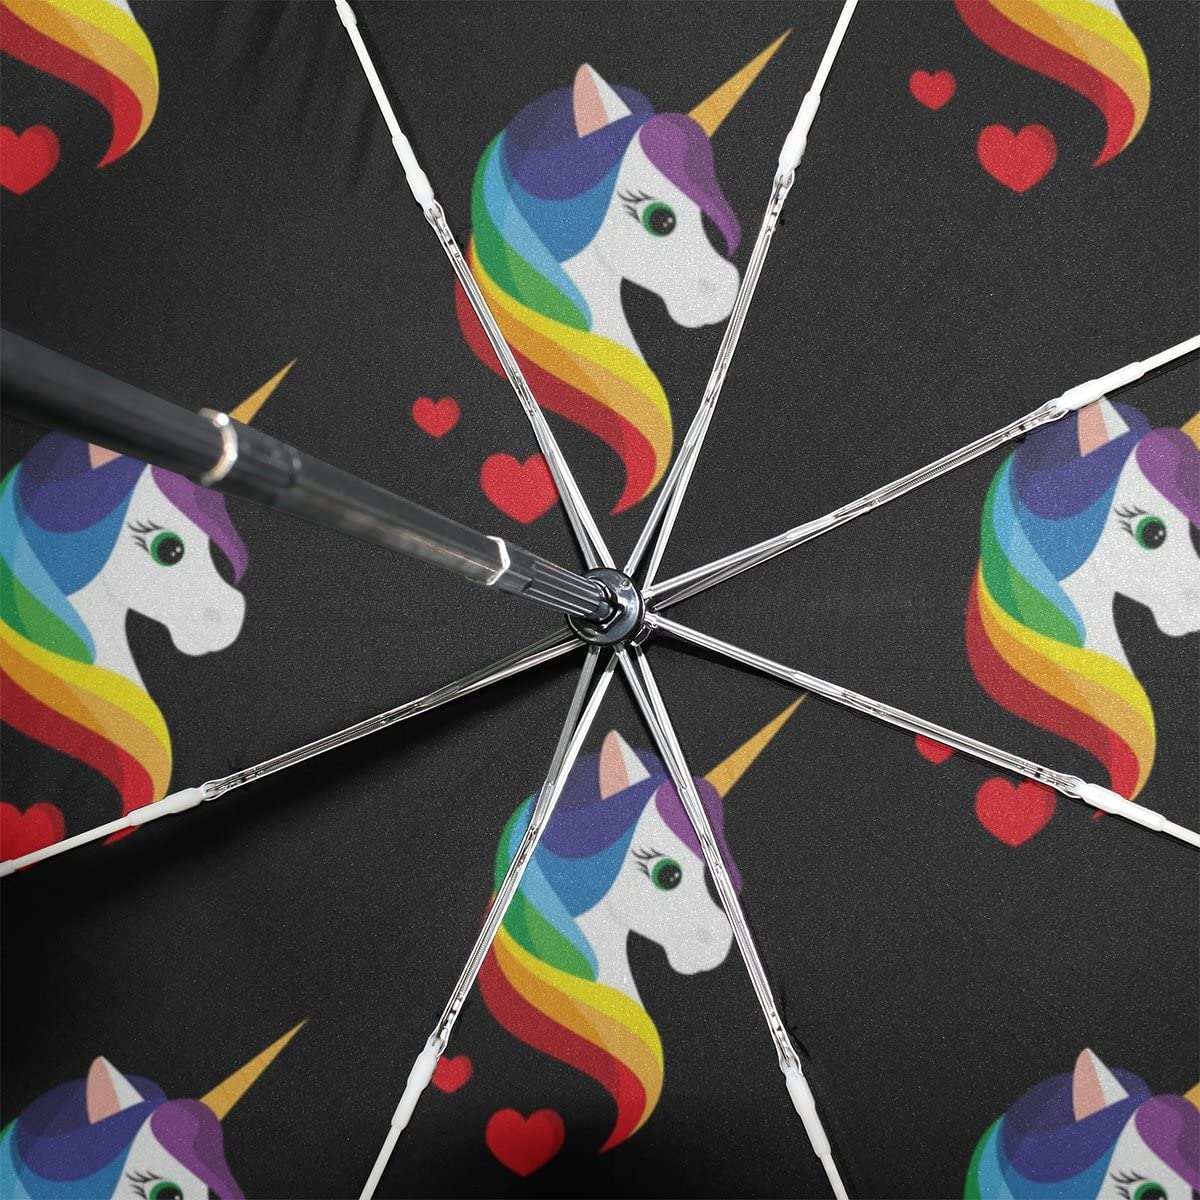 GIOVANIOR Unicorn Rainbow Umbrella Double Sided Canopy Auto Open Close Foldable Travel Rain Umbrellas